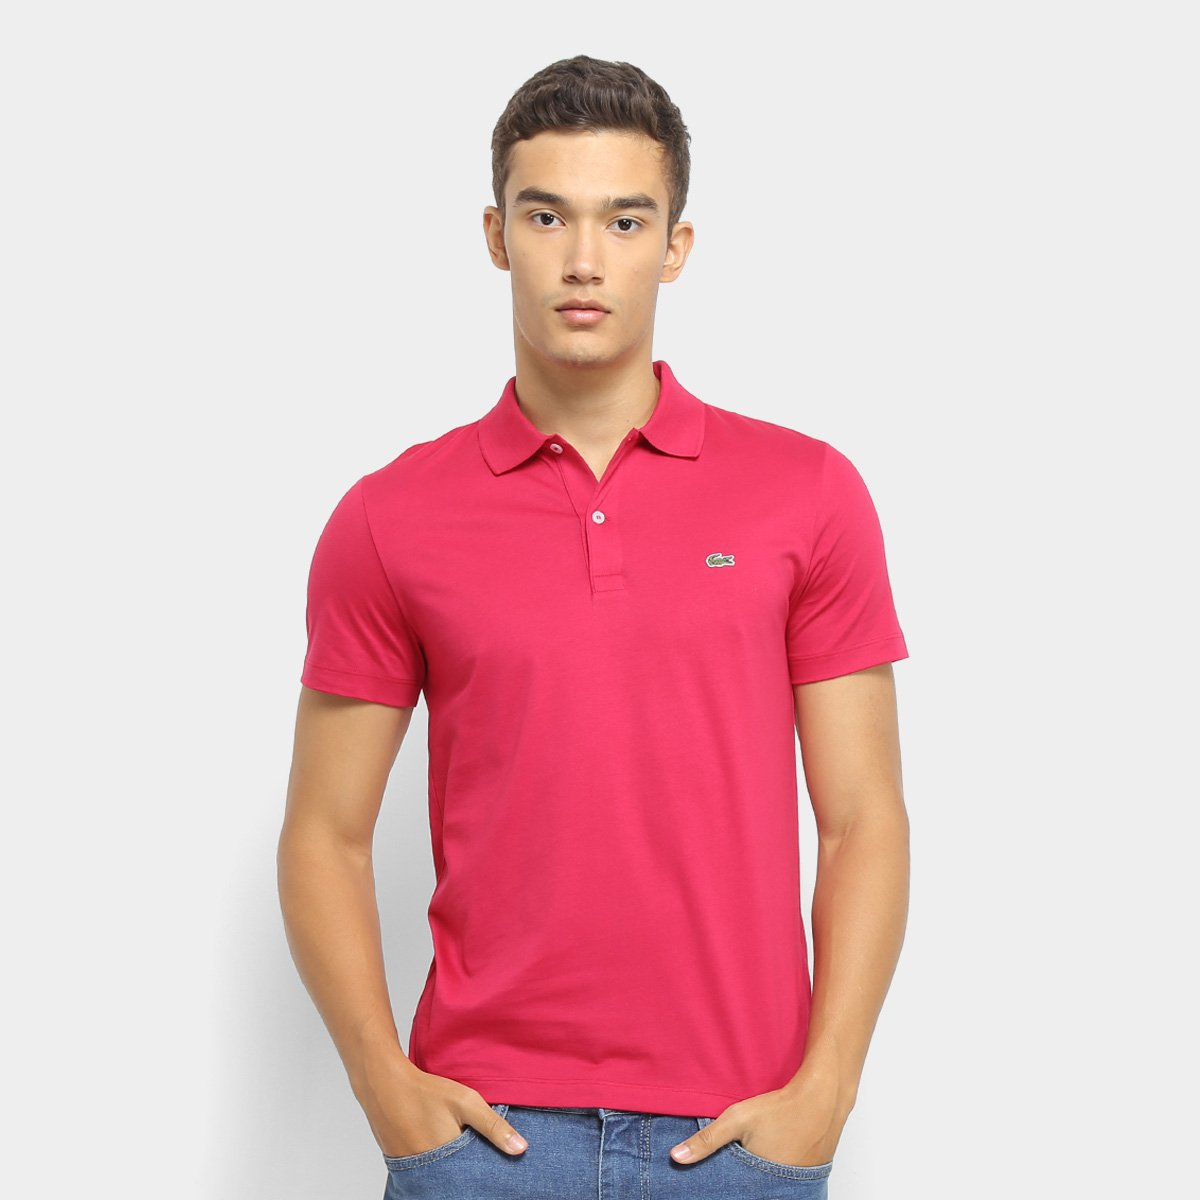 best service 31fbf 30a9e Camisa Polo Lacoste Malha Original Fit Masculina - Rosa